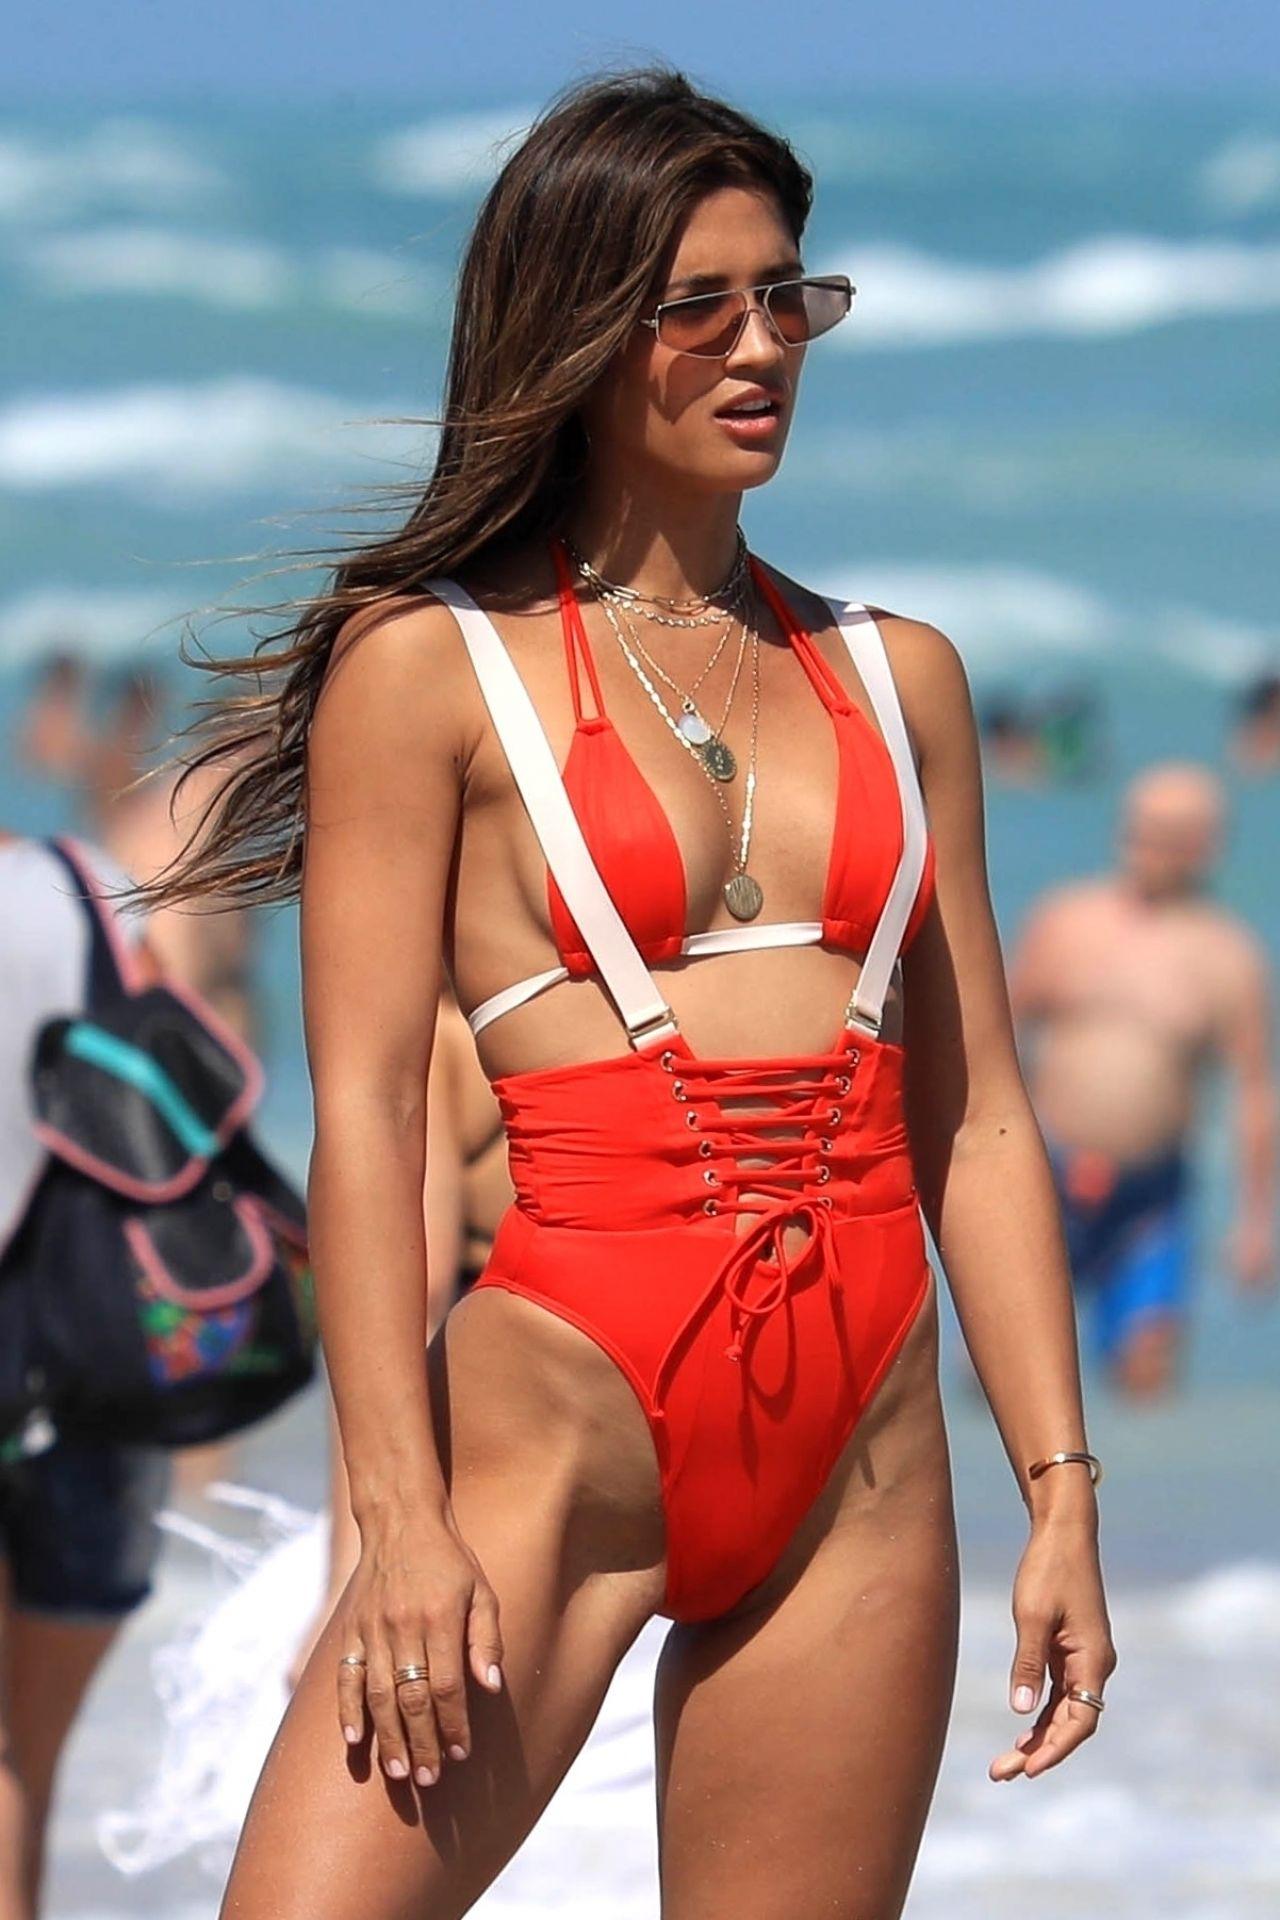 Rocky Barnes Impromptu Swimwear Photoshoot In Miami